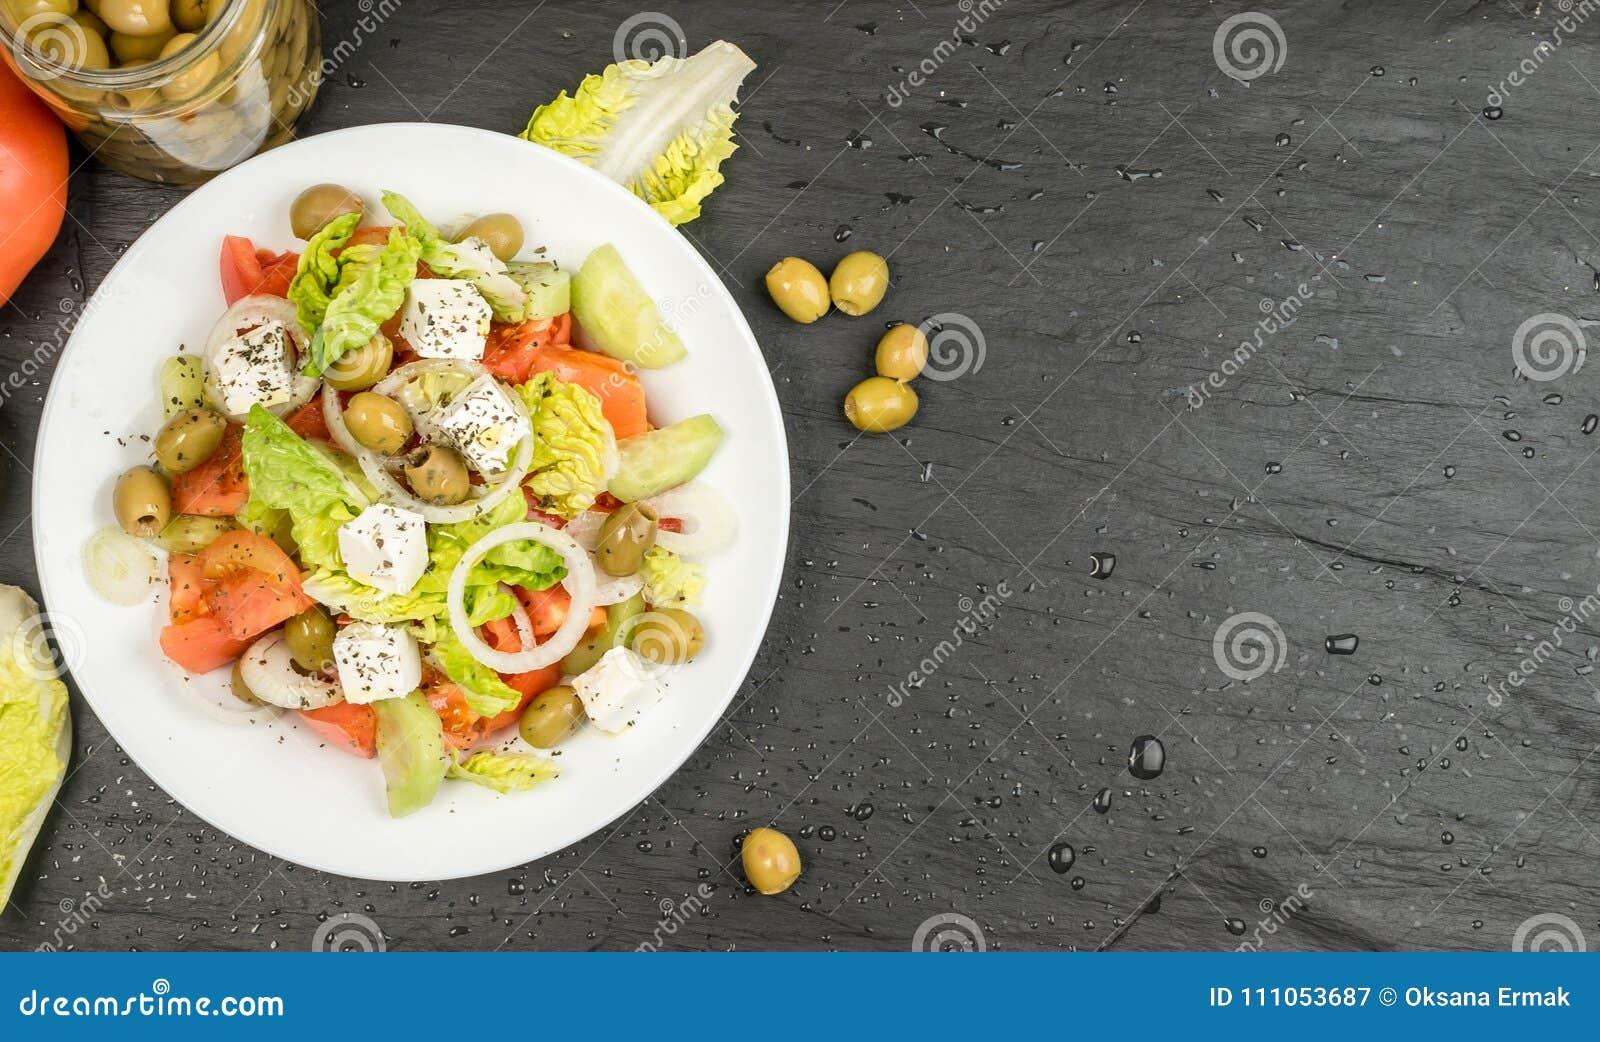 Greek Salad Or Garden Salad Stock Image Image Of Chef